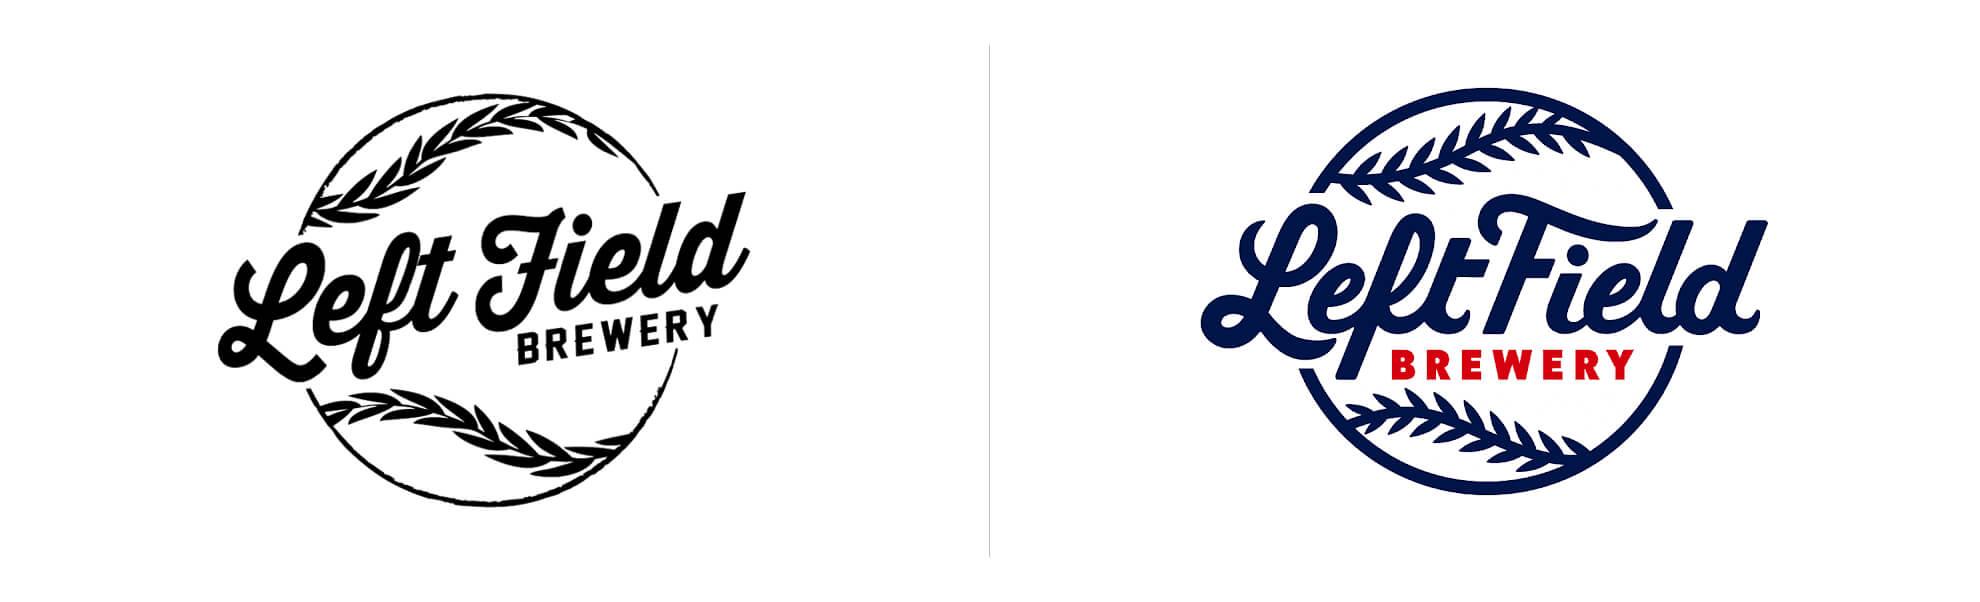 stare inowe logo browaru left field